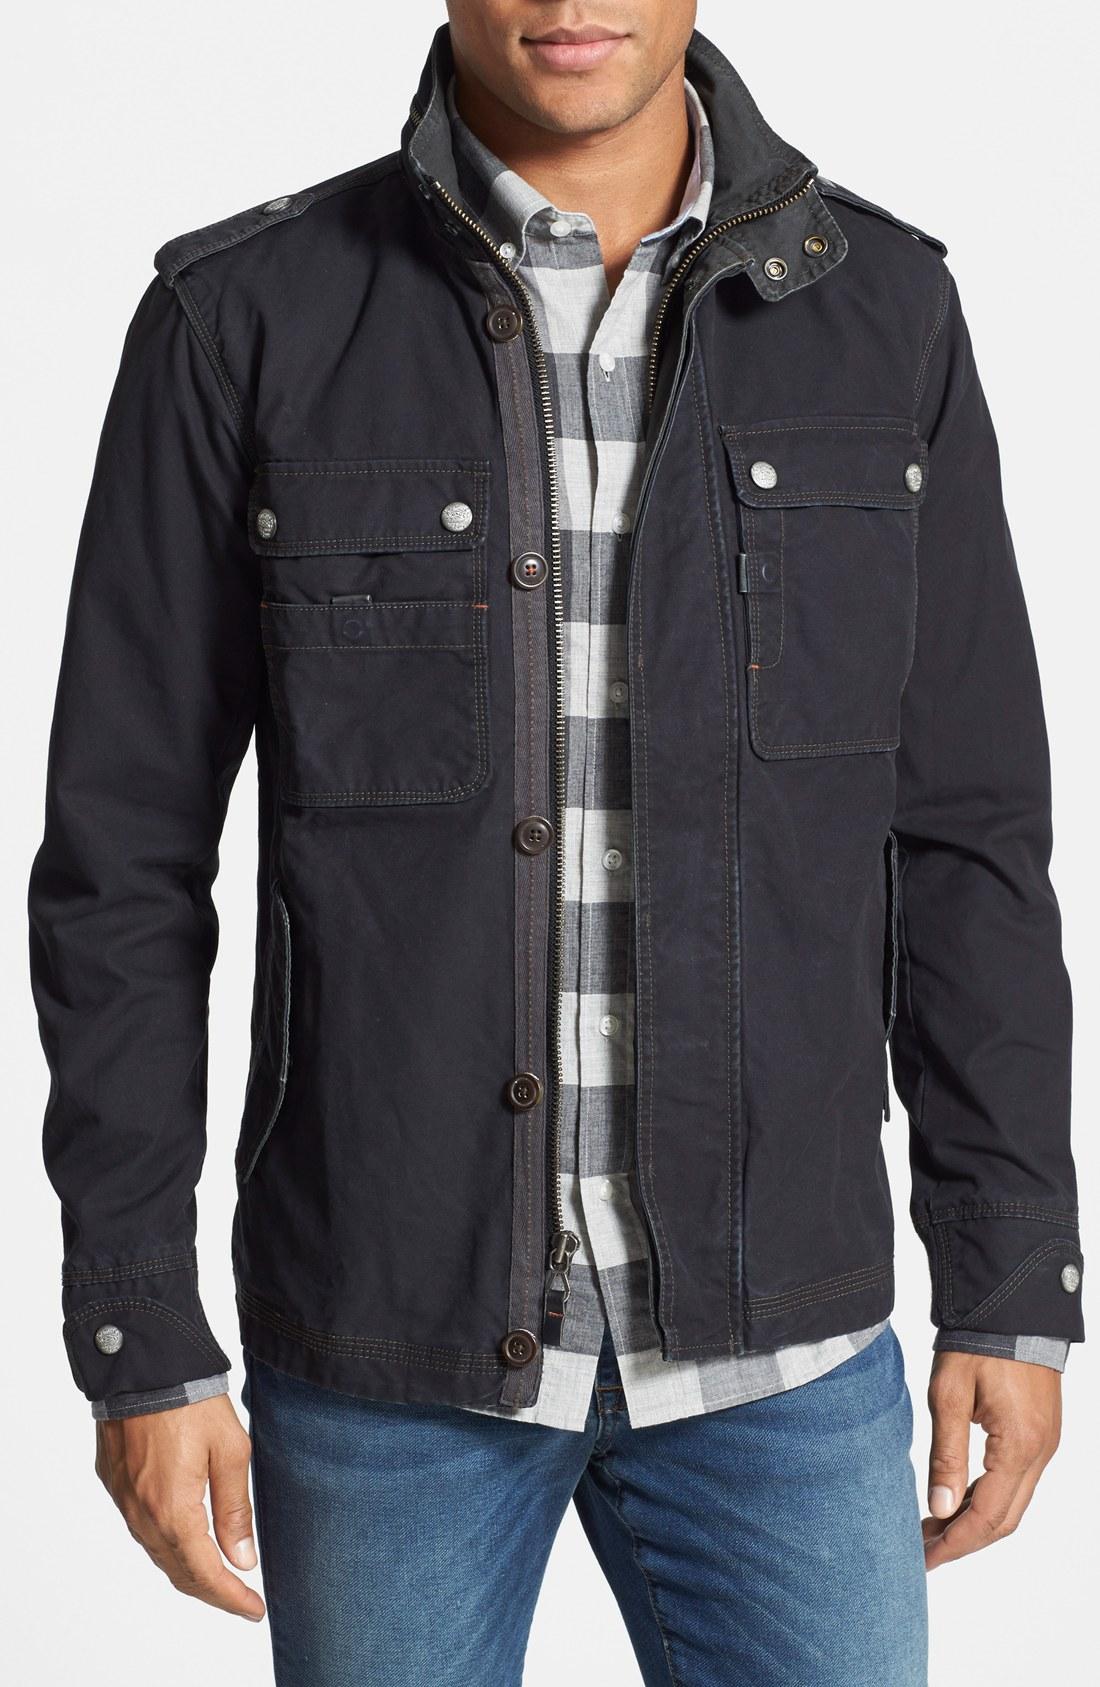 jeremiah u0027paxtonu0027 military jacket with stowaway hood   nordstrom YVSESTZ